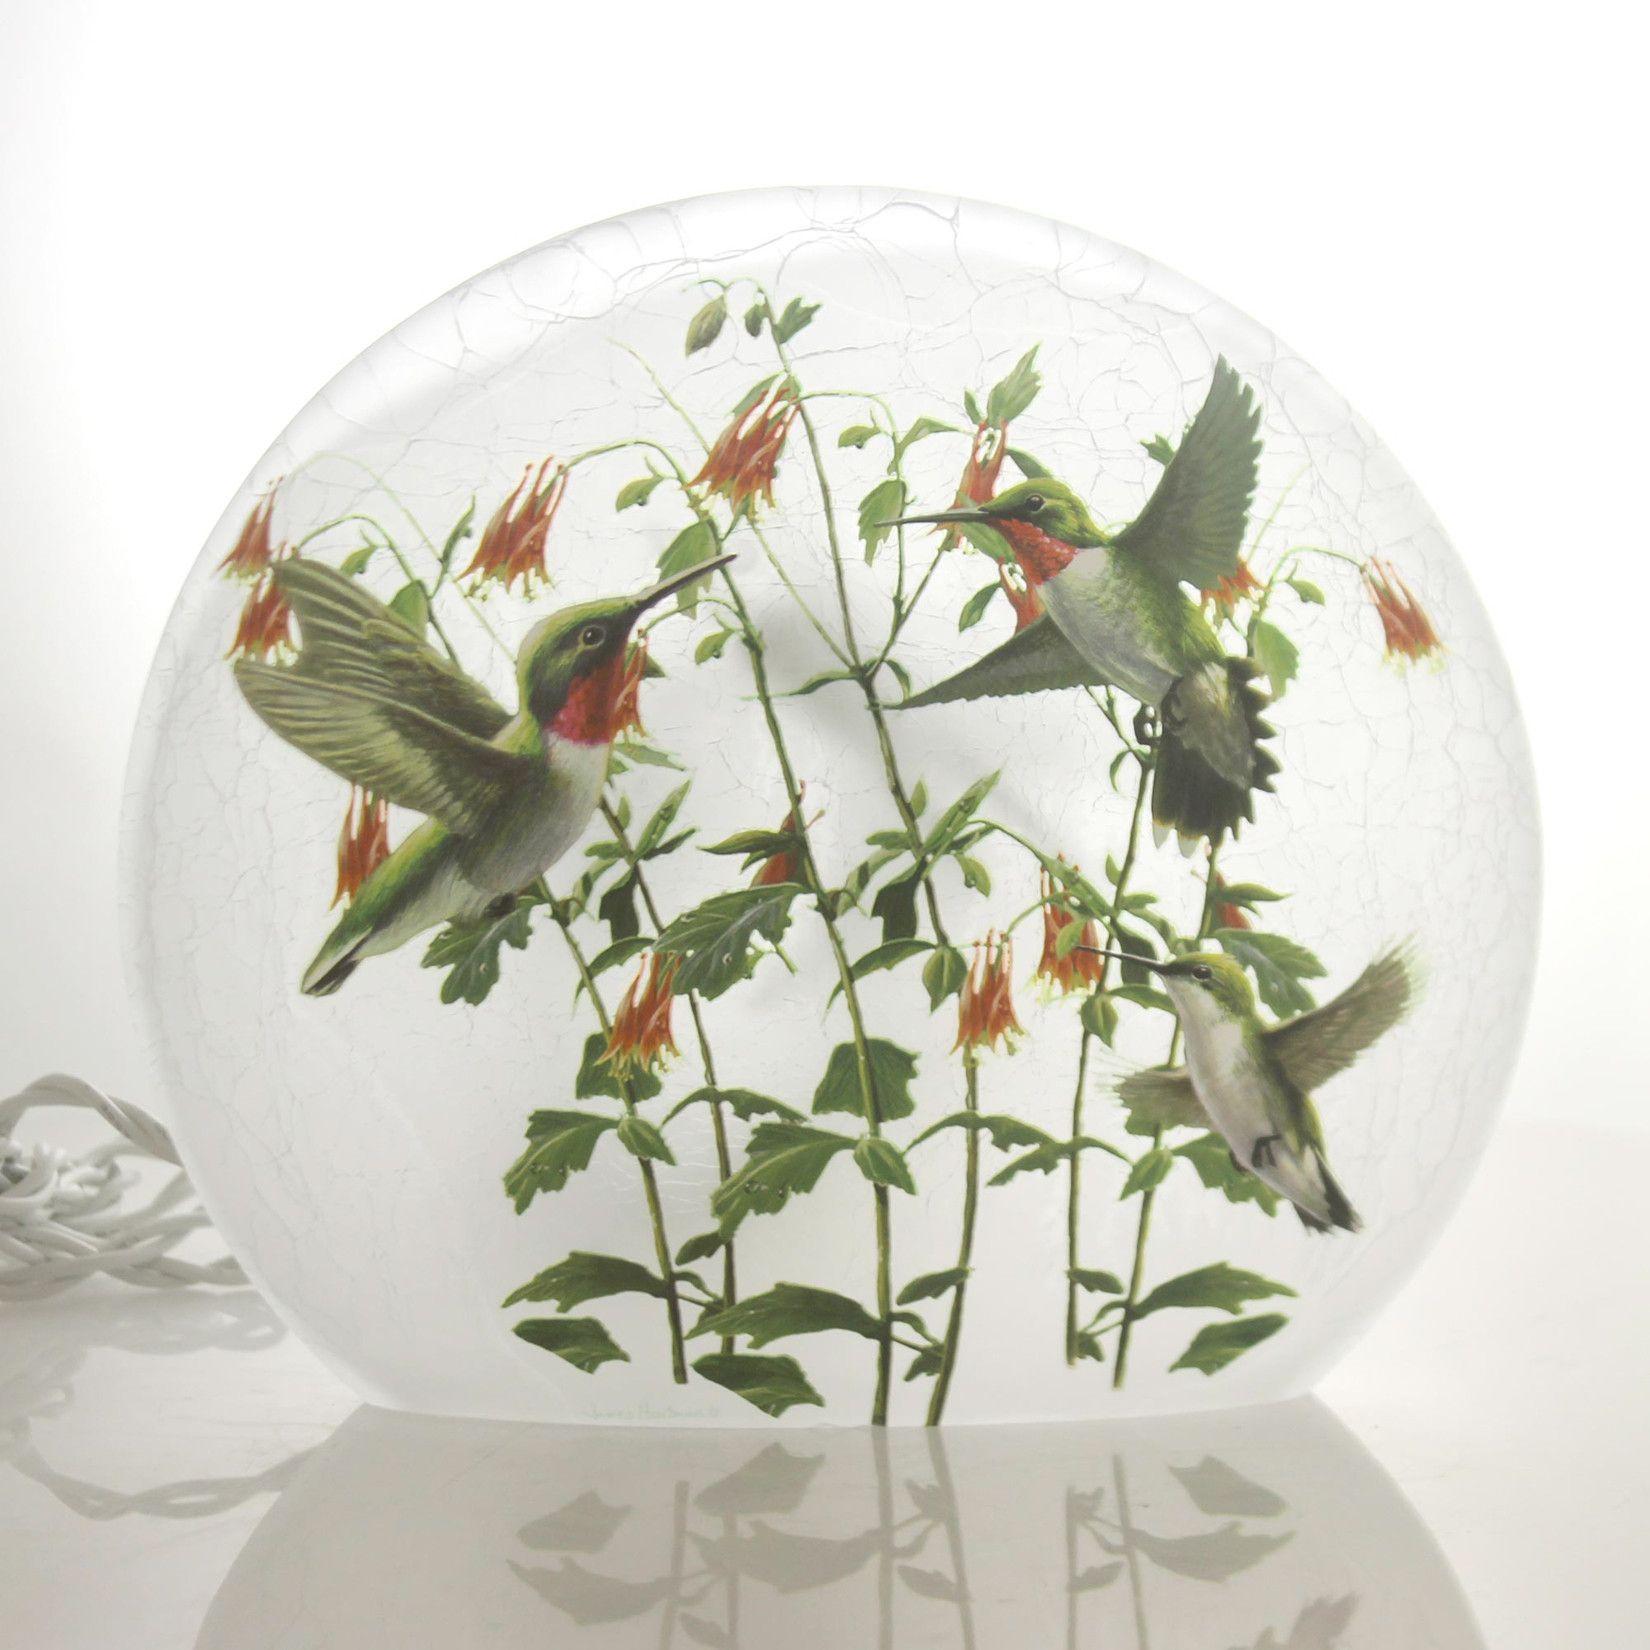 Stony Creek Lighted Round Glass/Hummingbird Home Decor